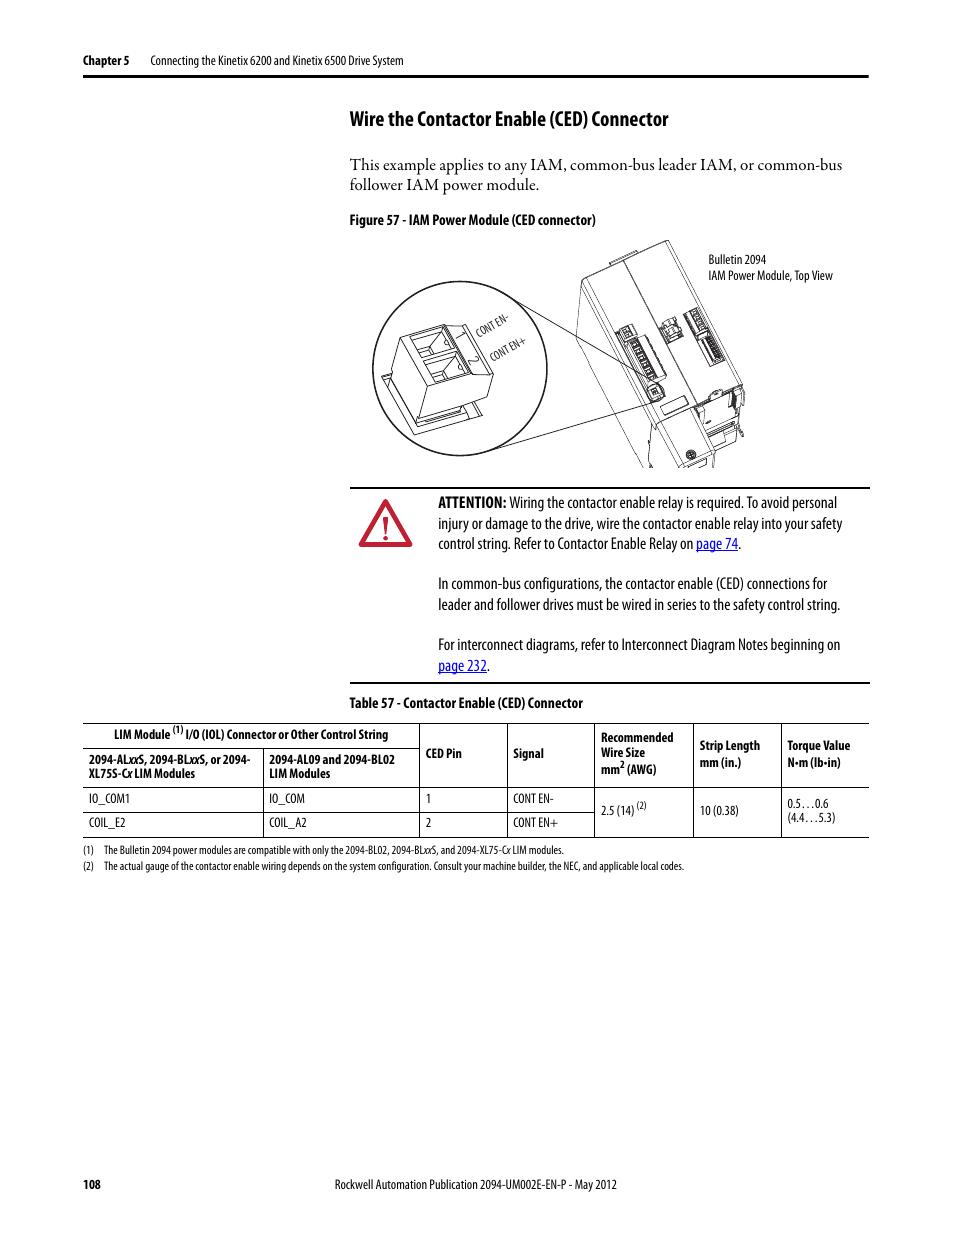 nec axis user manual open source user manual u2022 rh dramatic varieties com NEC Dterm IP Manual NEC Dterm IP Manual